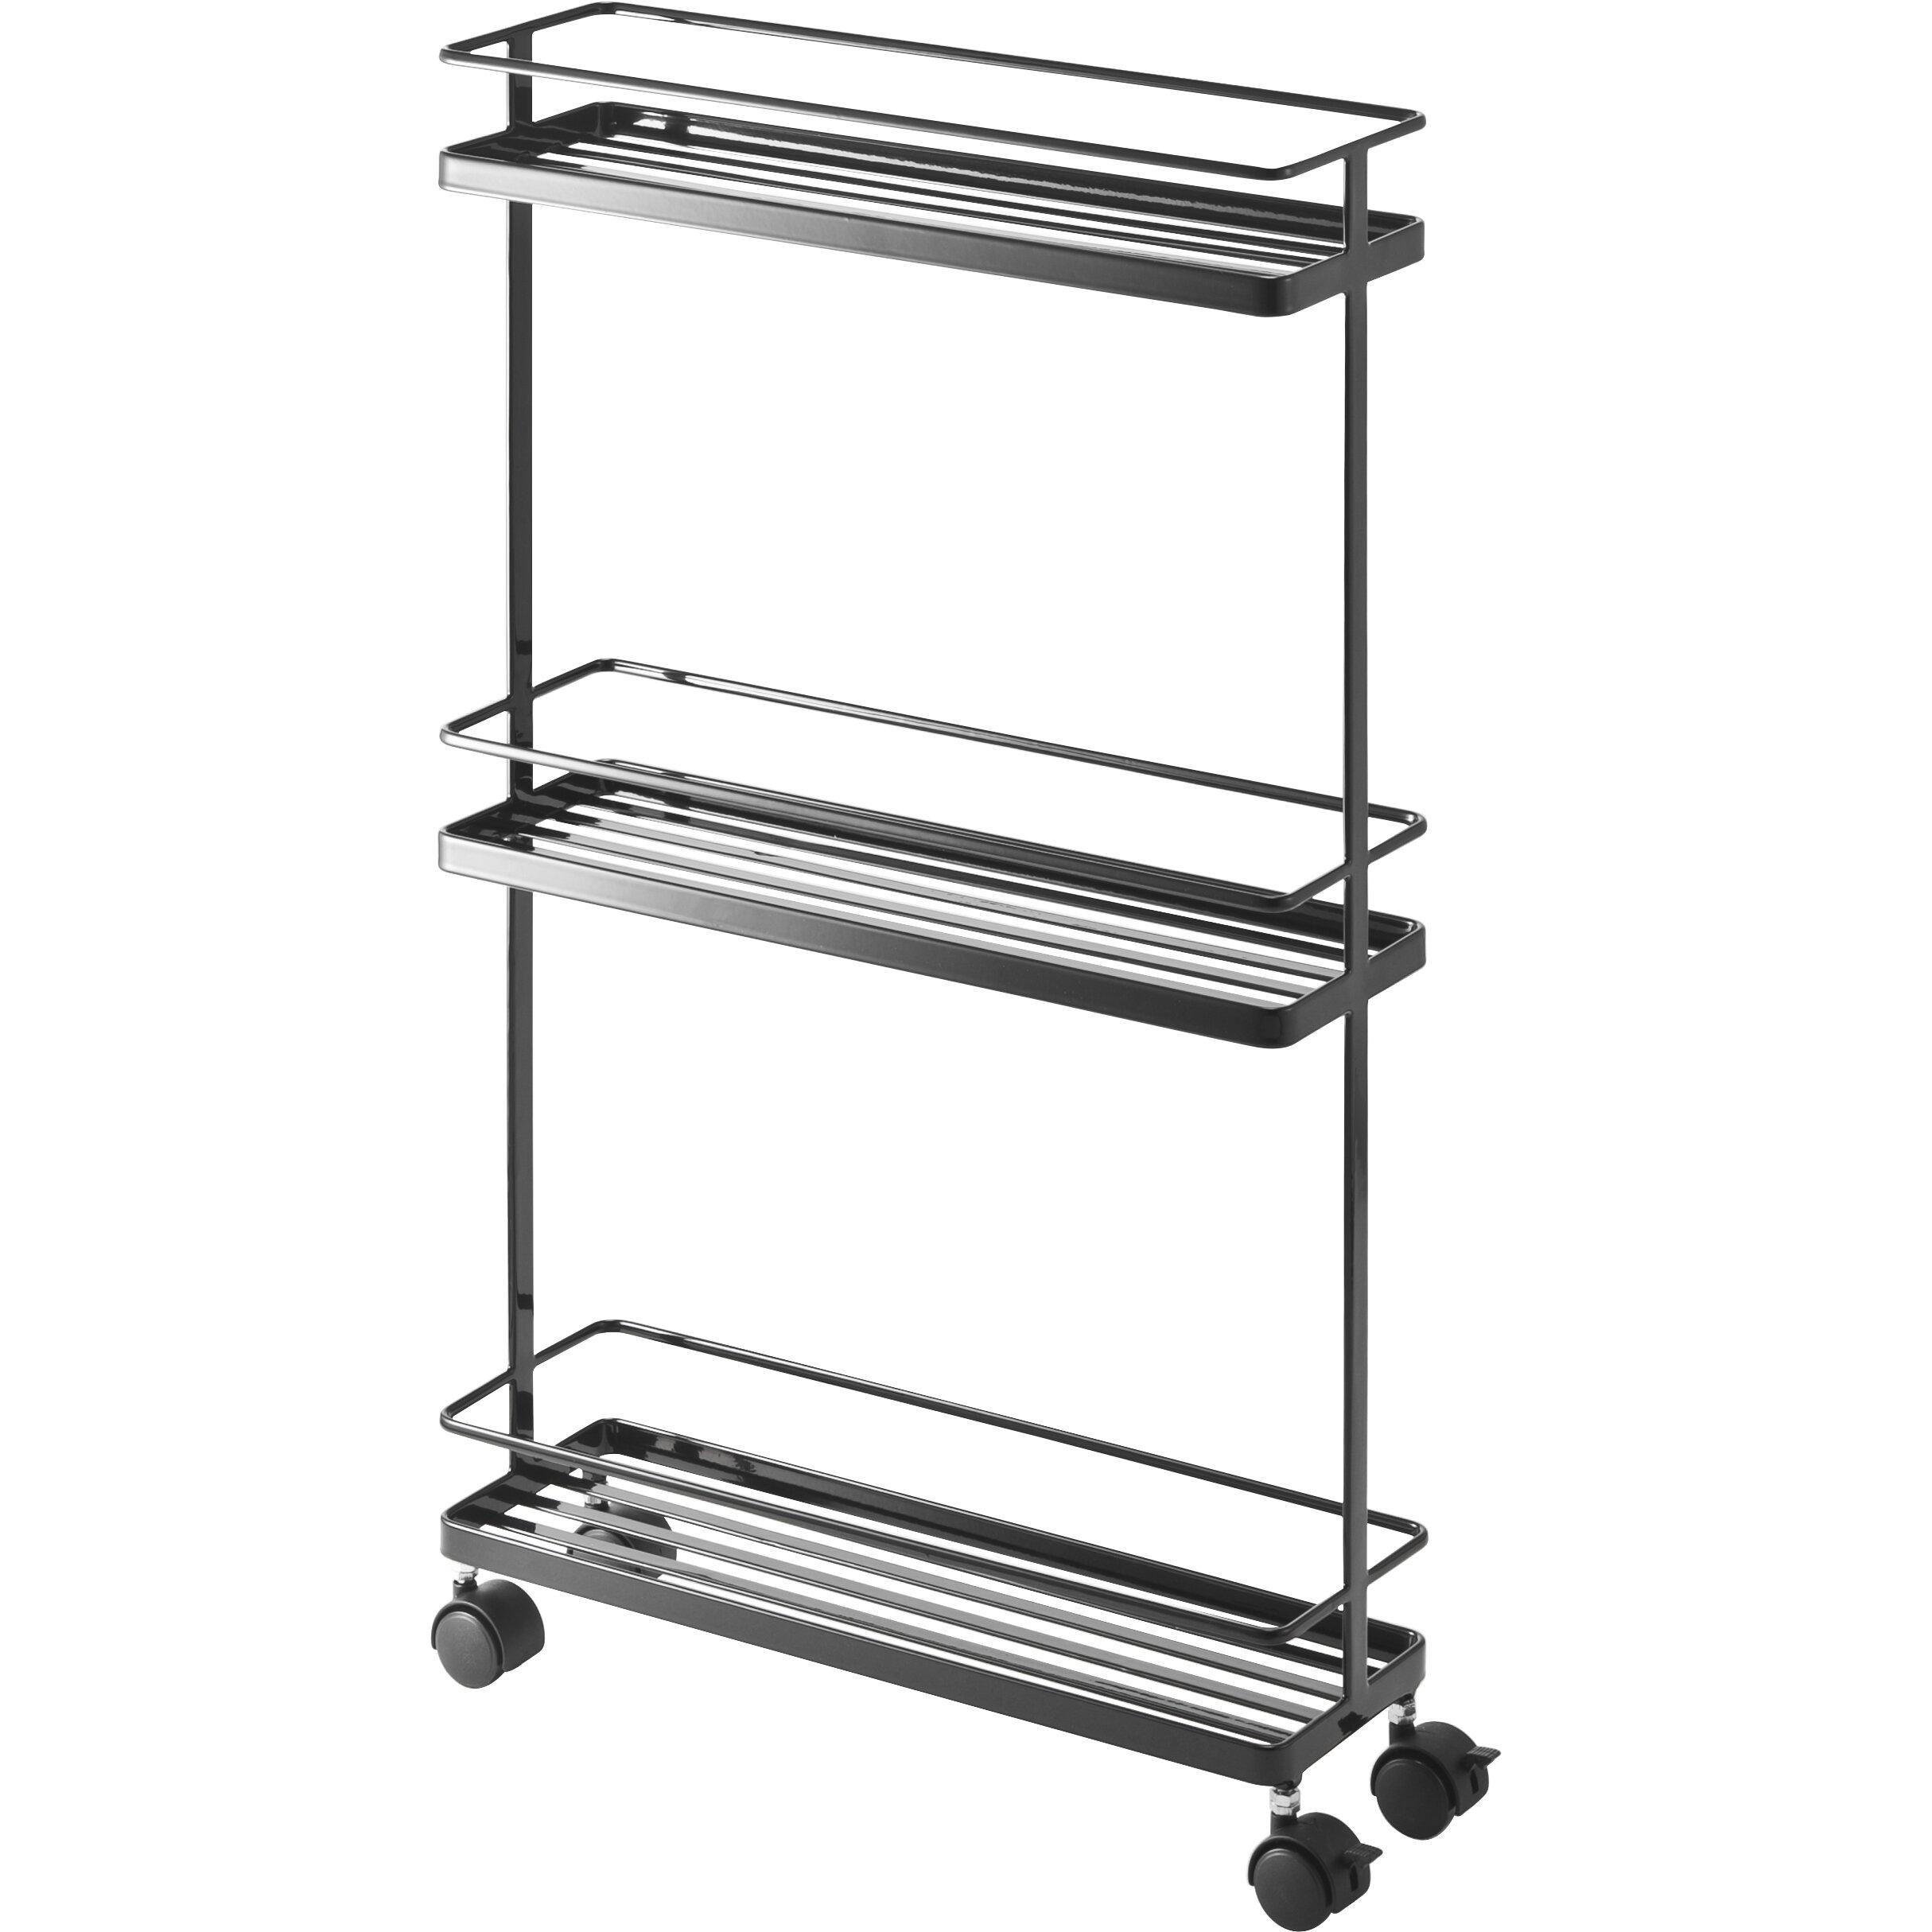 Kitchen Storage Carts: Yamazaki USA Tower Rolling Kitchen Storage Cart & Reviews